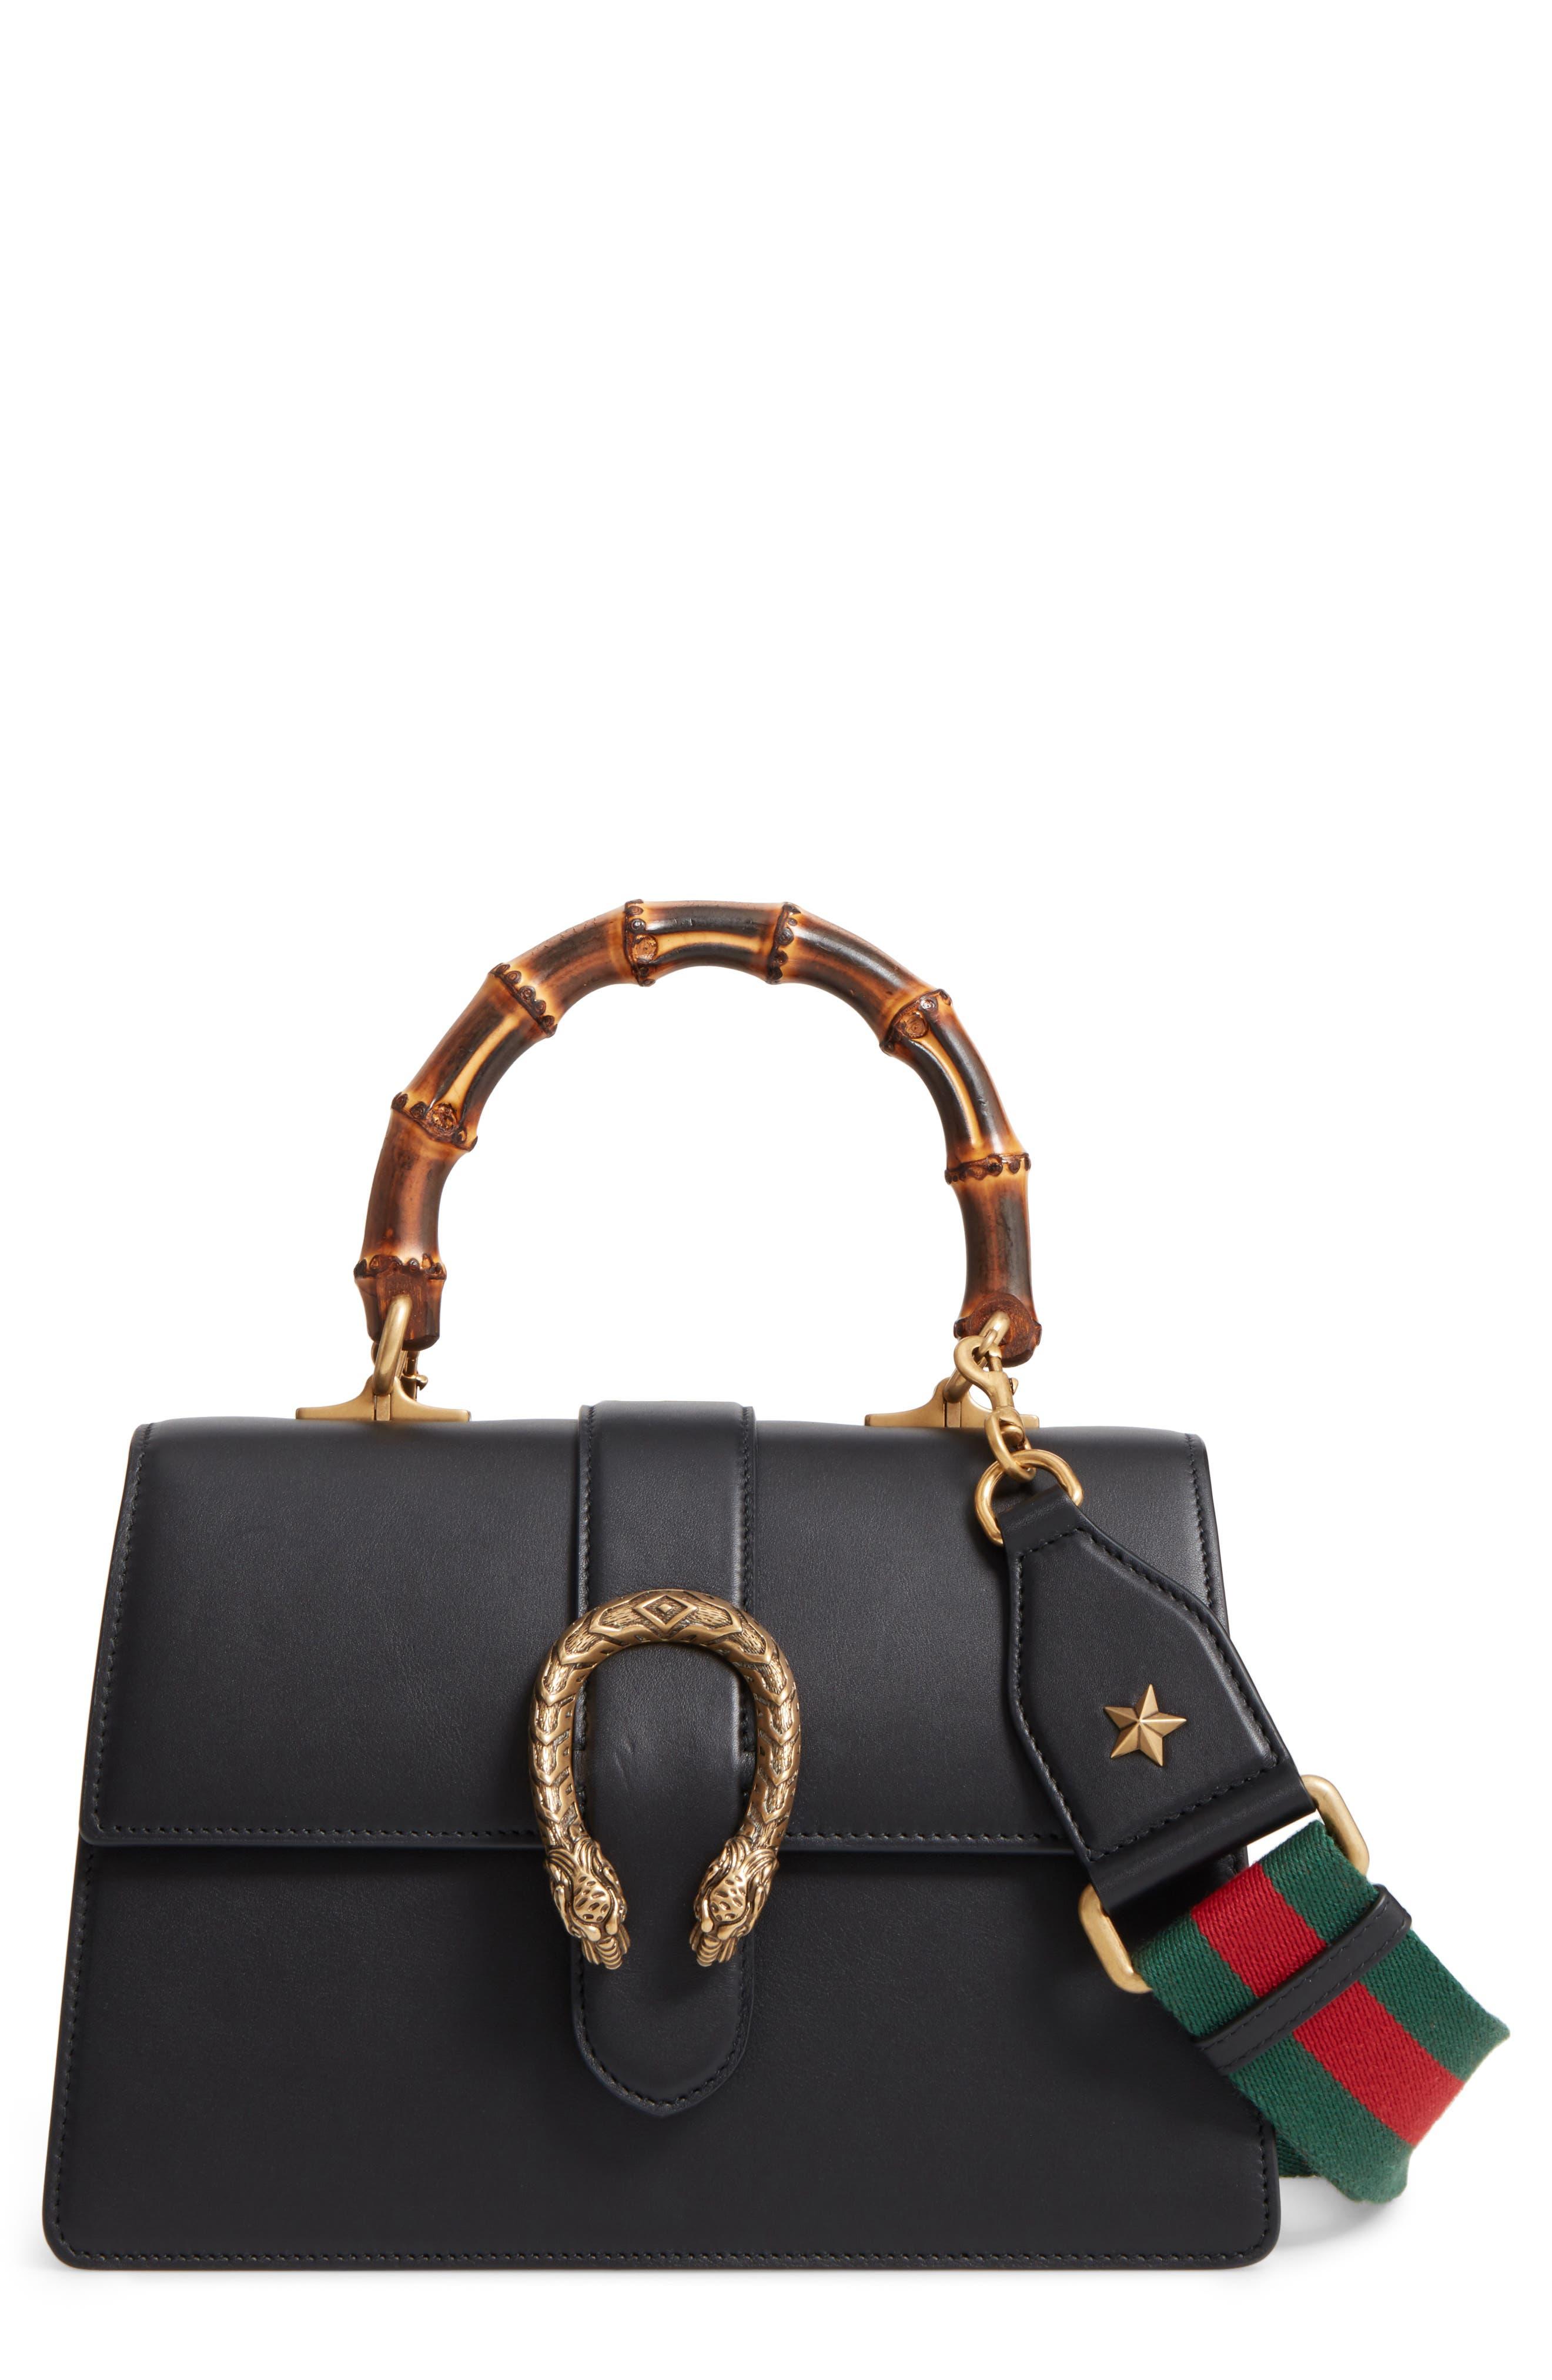 Large Dionysus Top Handle Leather Shoulder Bag,                             Main thumbnail 1, color,                             001